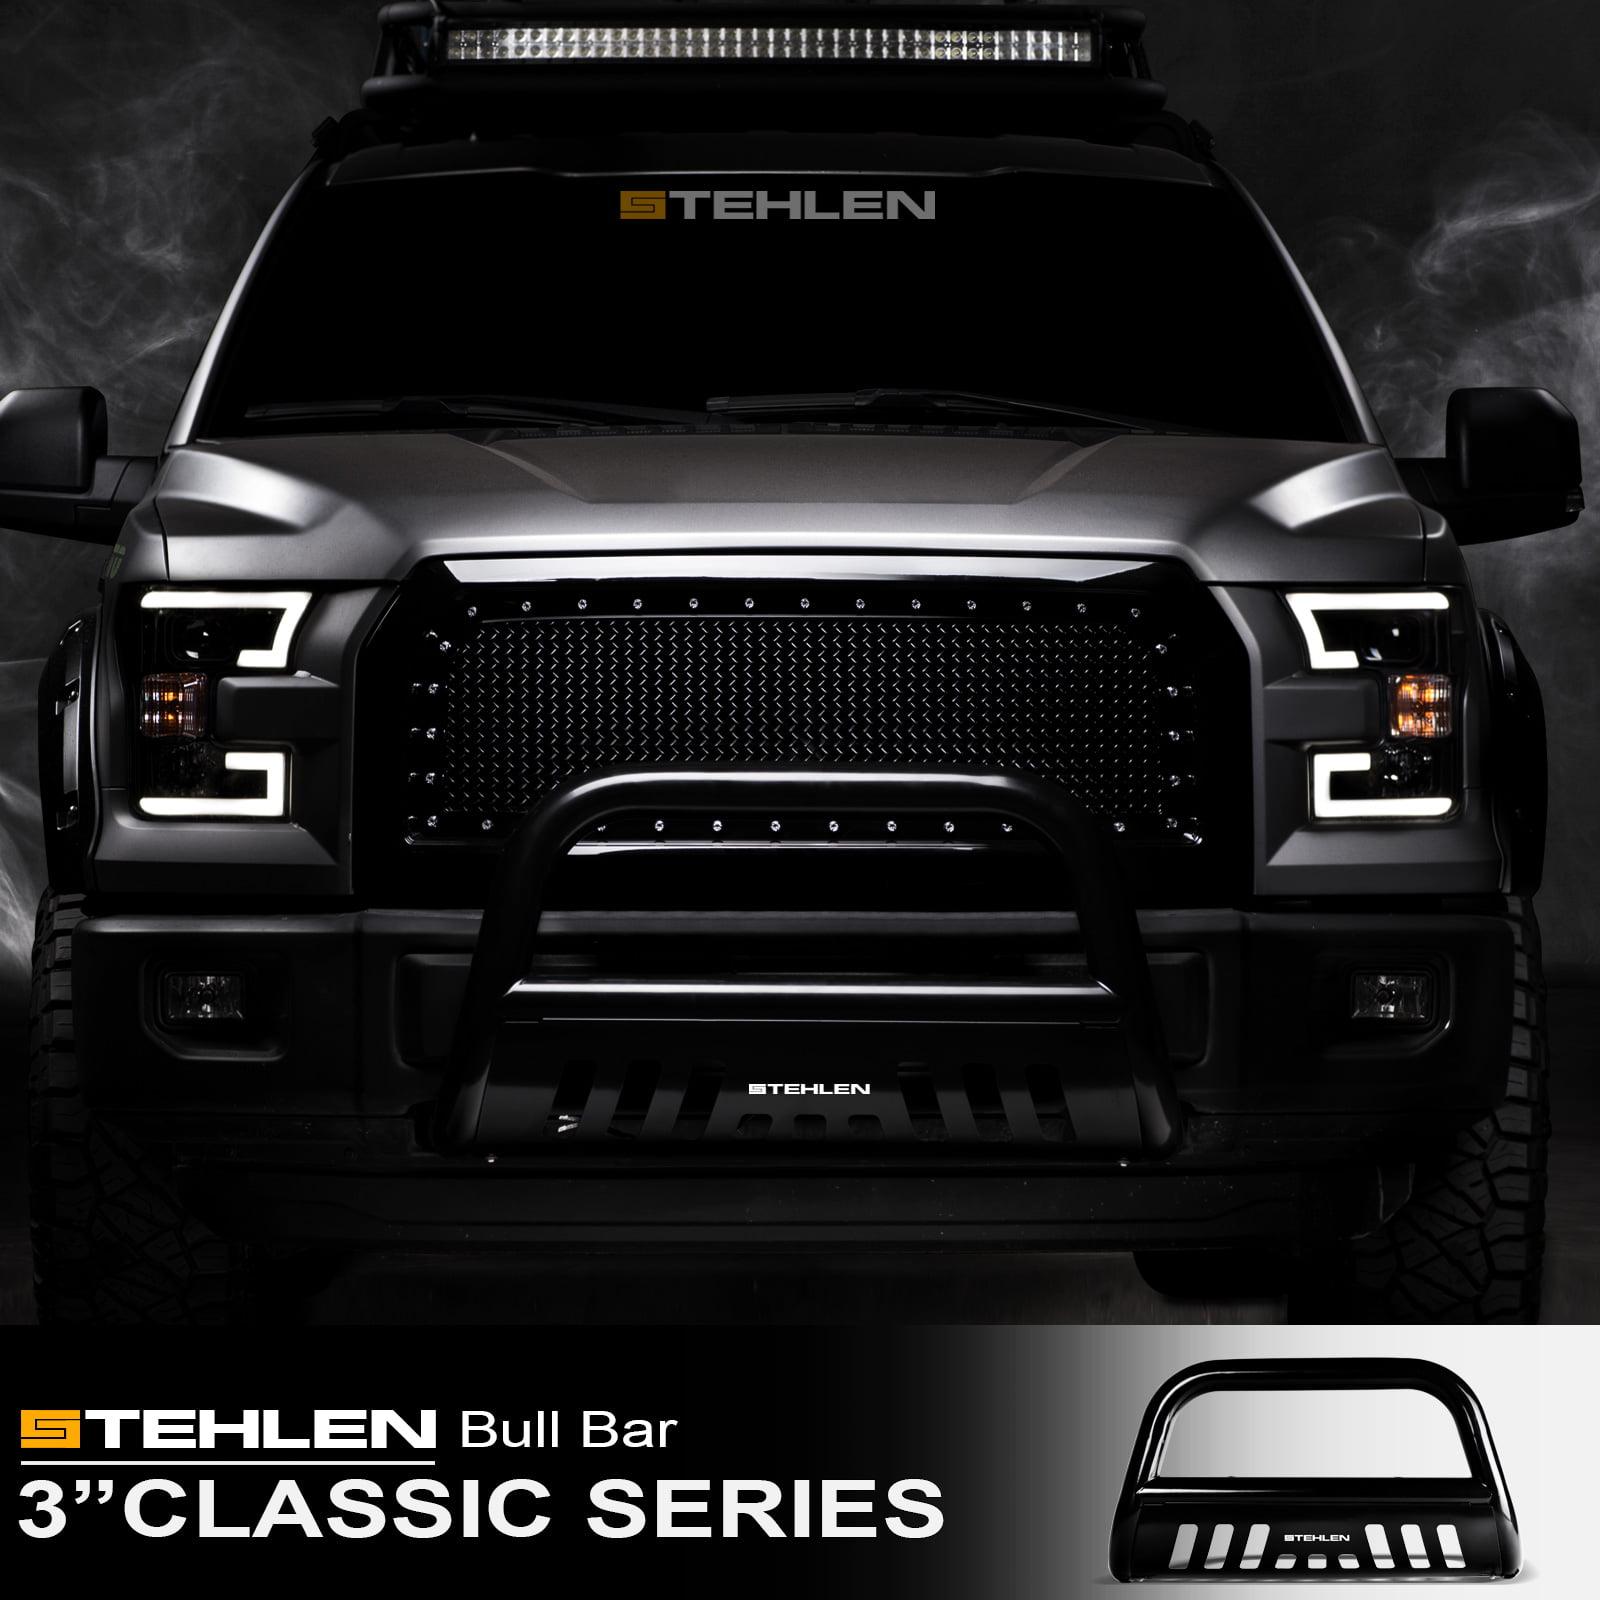 Stehlen 714937181885 3 Classic Series Bull Bar Black For 2008